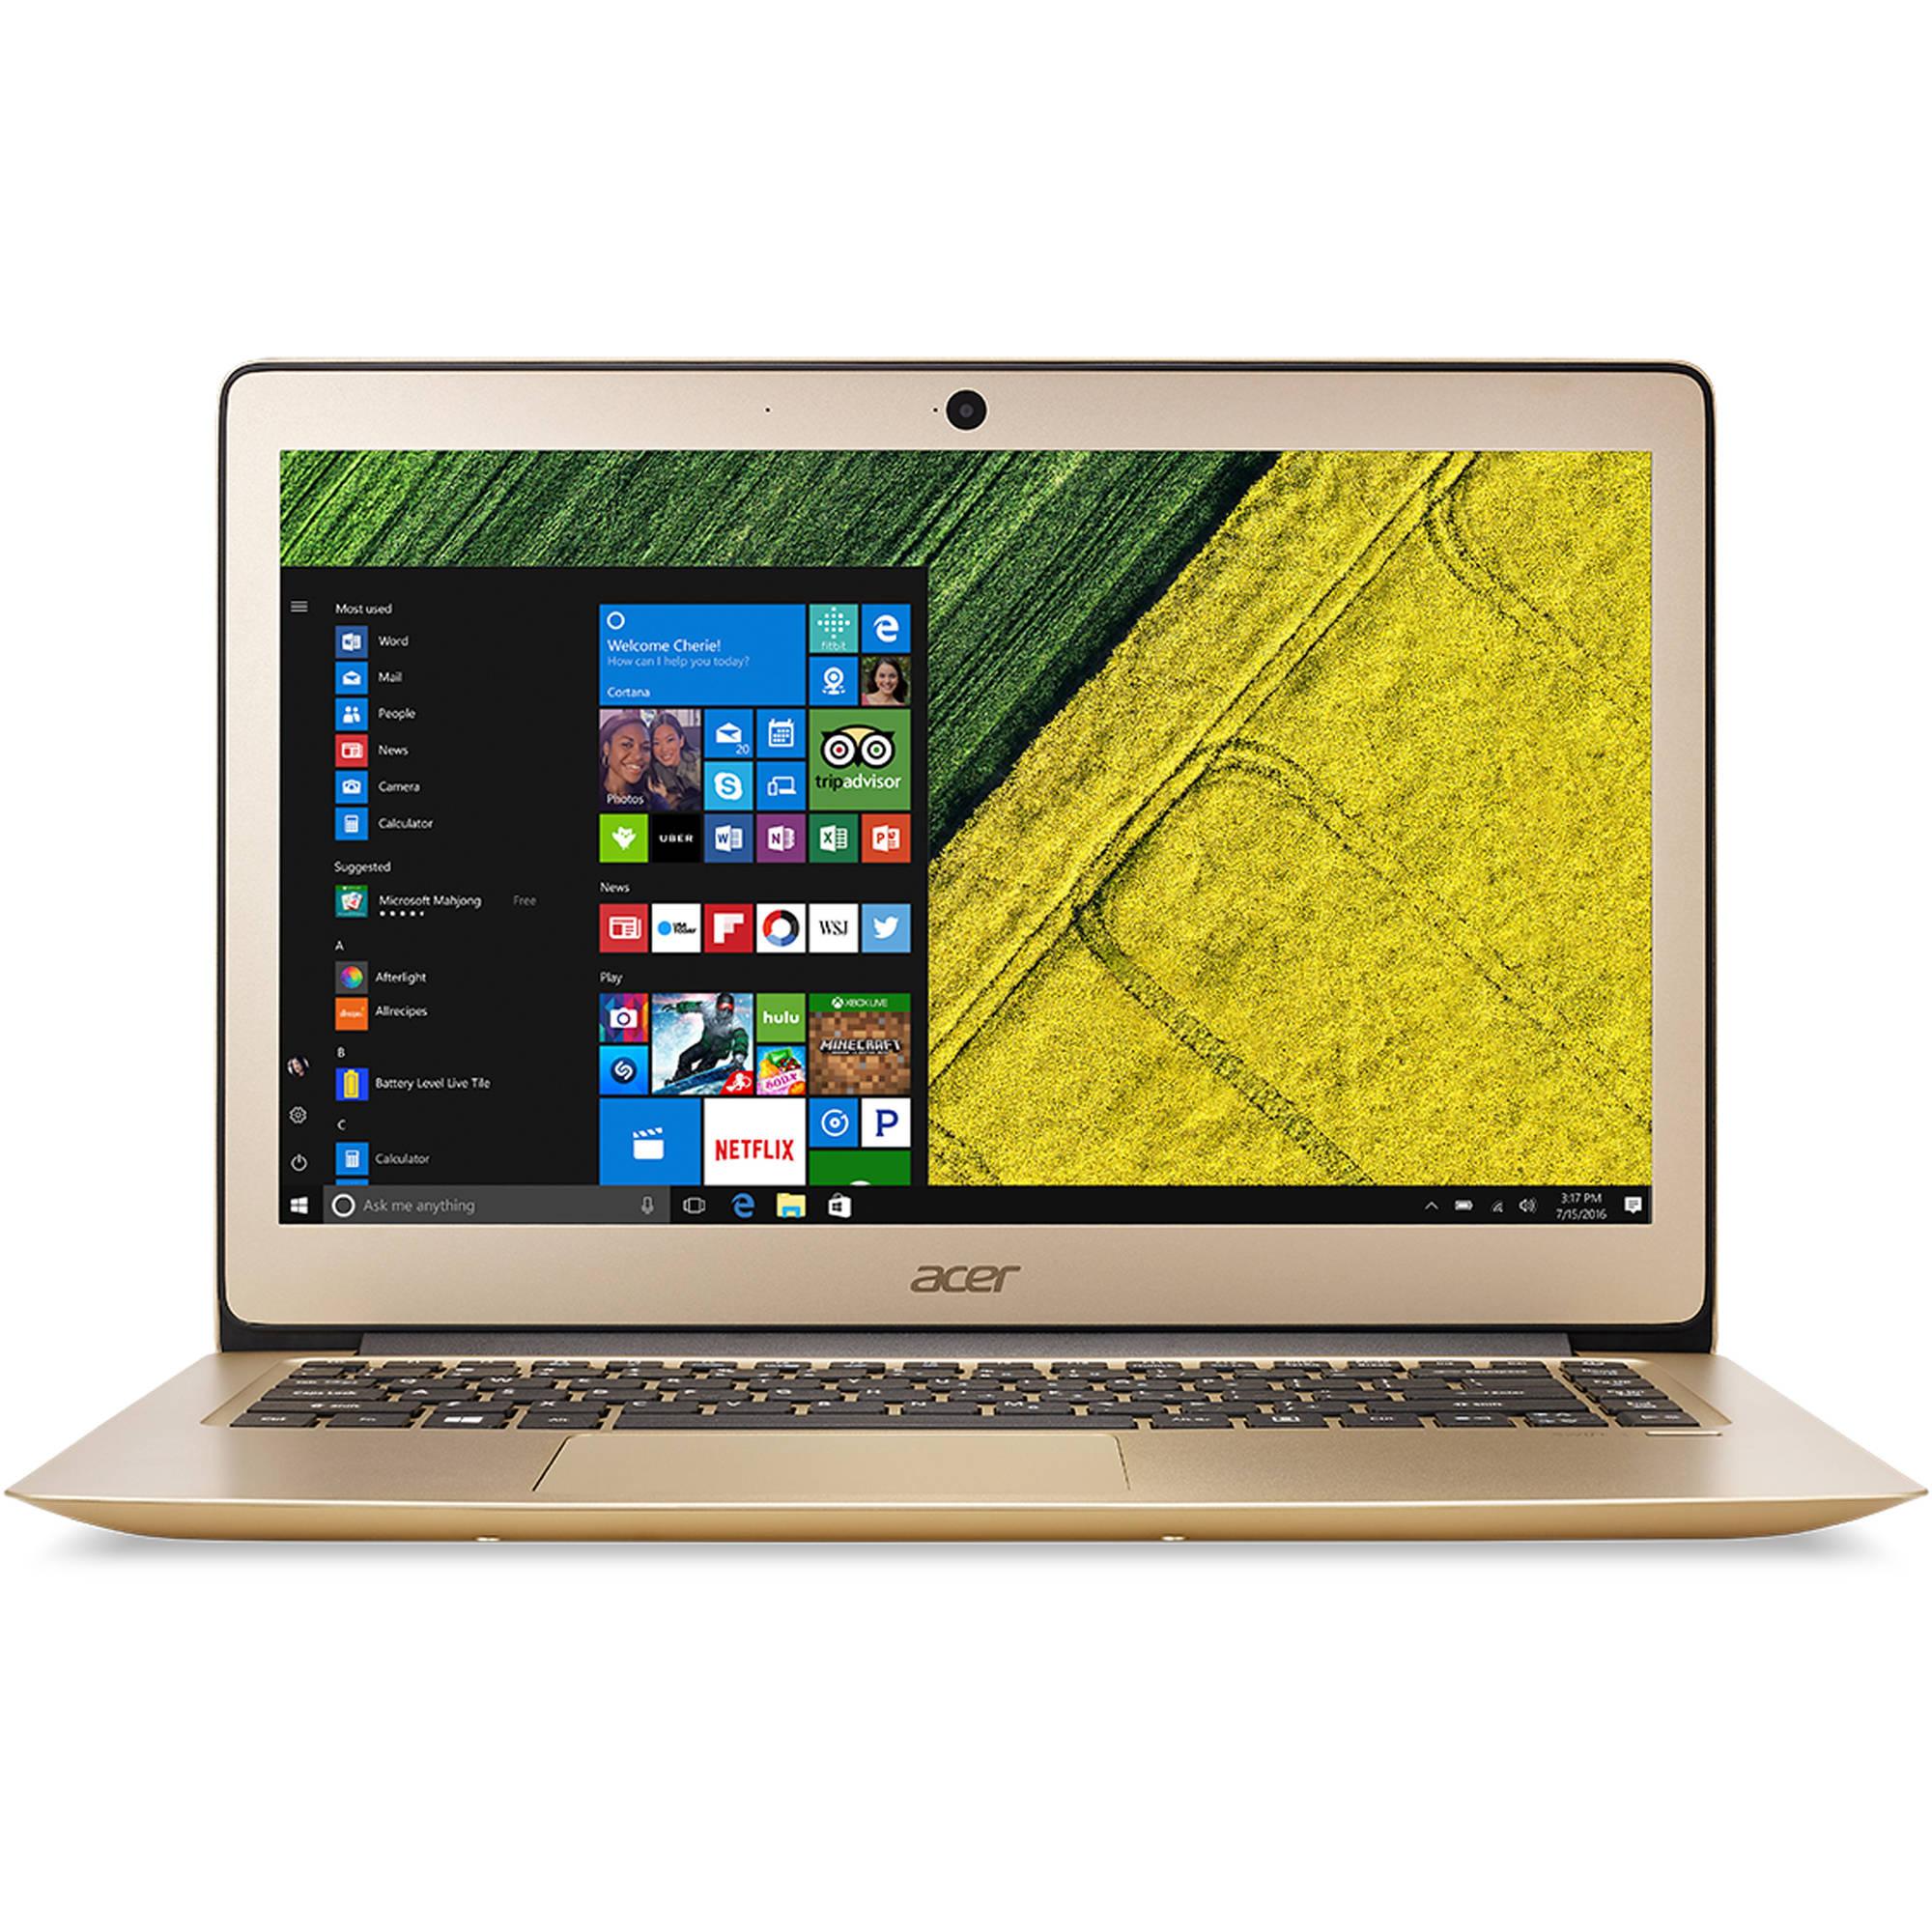 "Acer Swift 3 SF314-51-76R9 14.1"" Laptop, Windows 10 Home, Intel Core i7-6500U Processor, 8GB RAM, 256GB Solid State Drive"